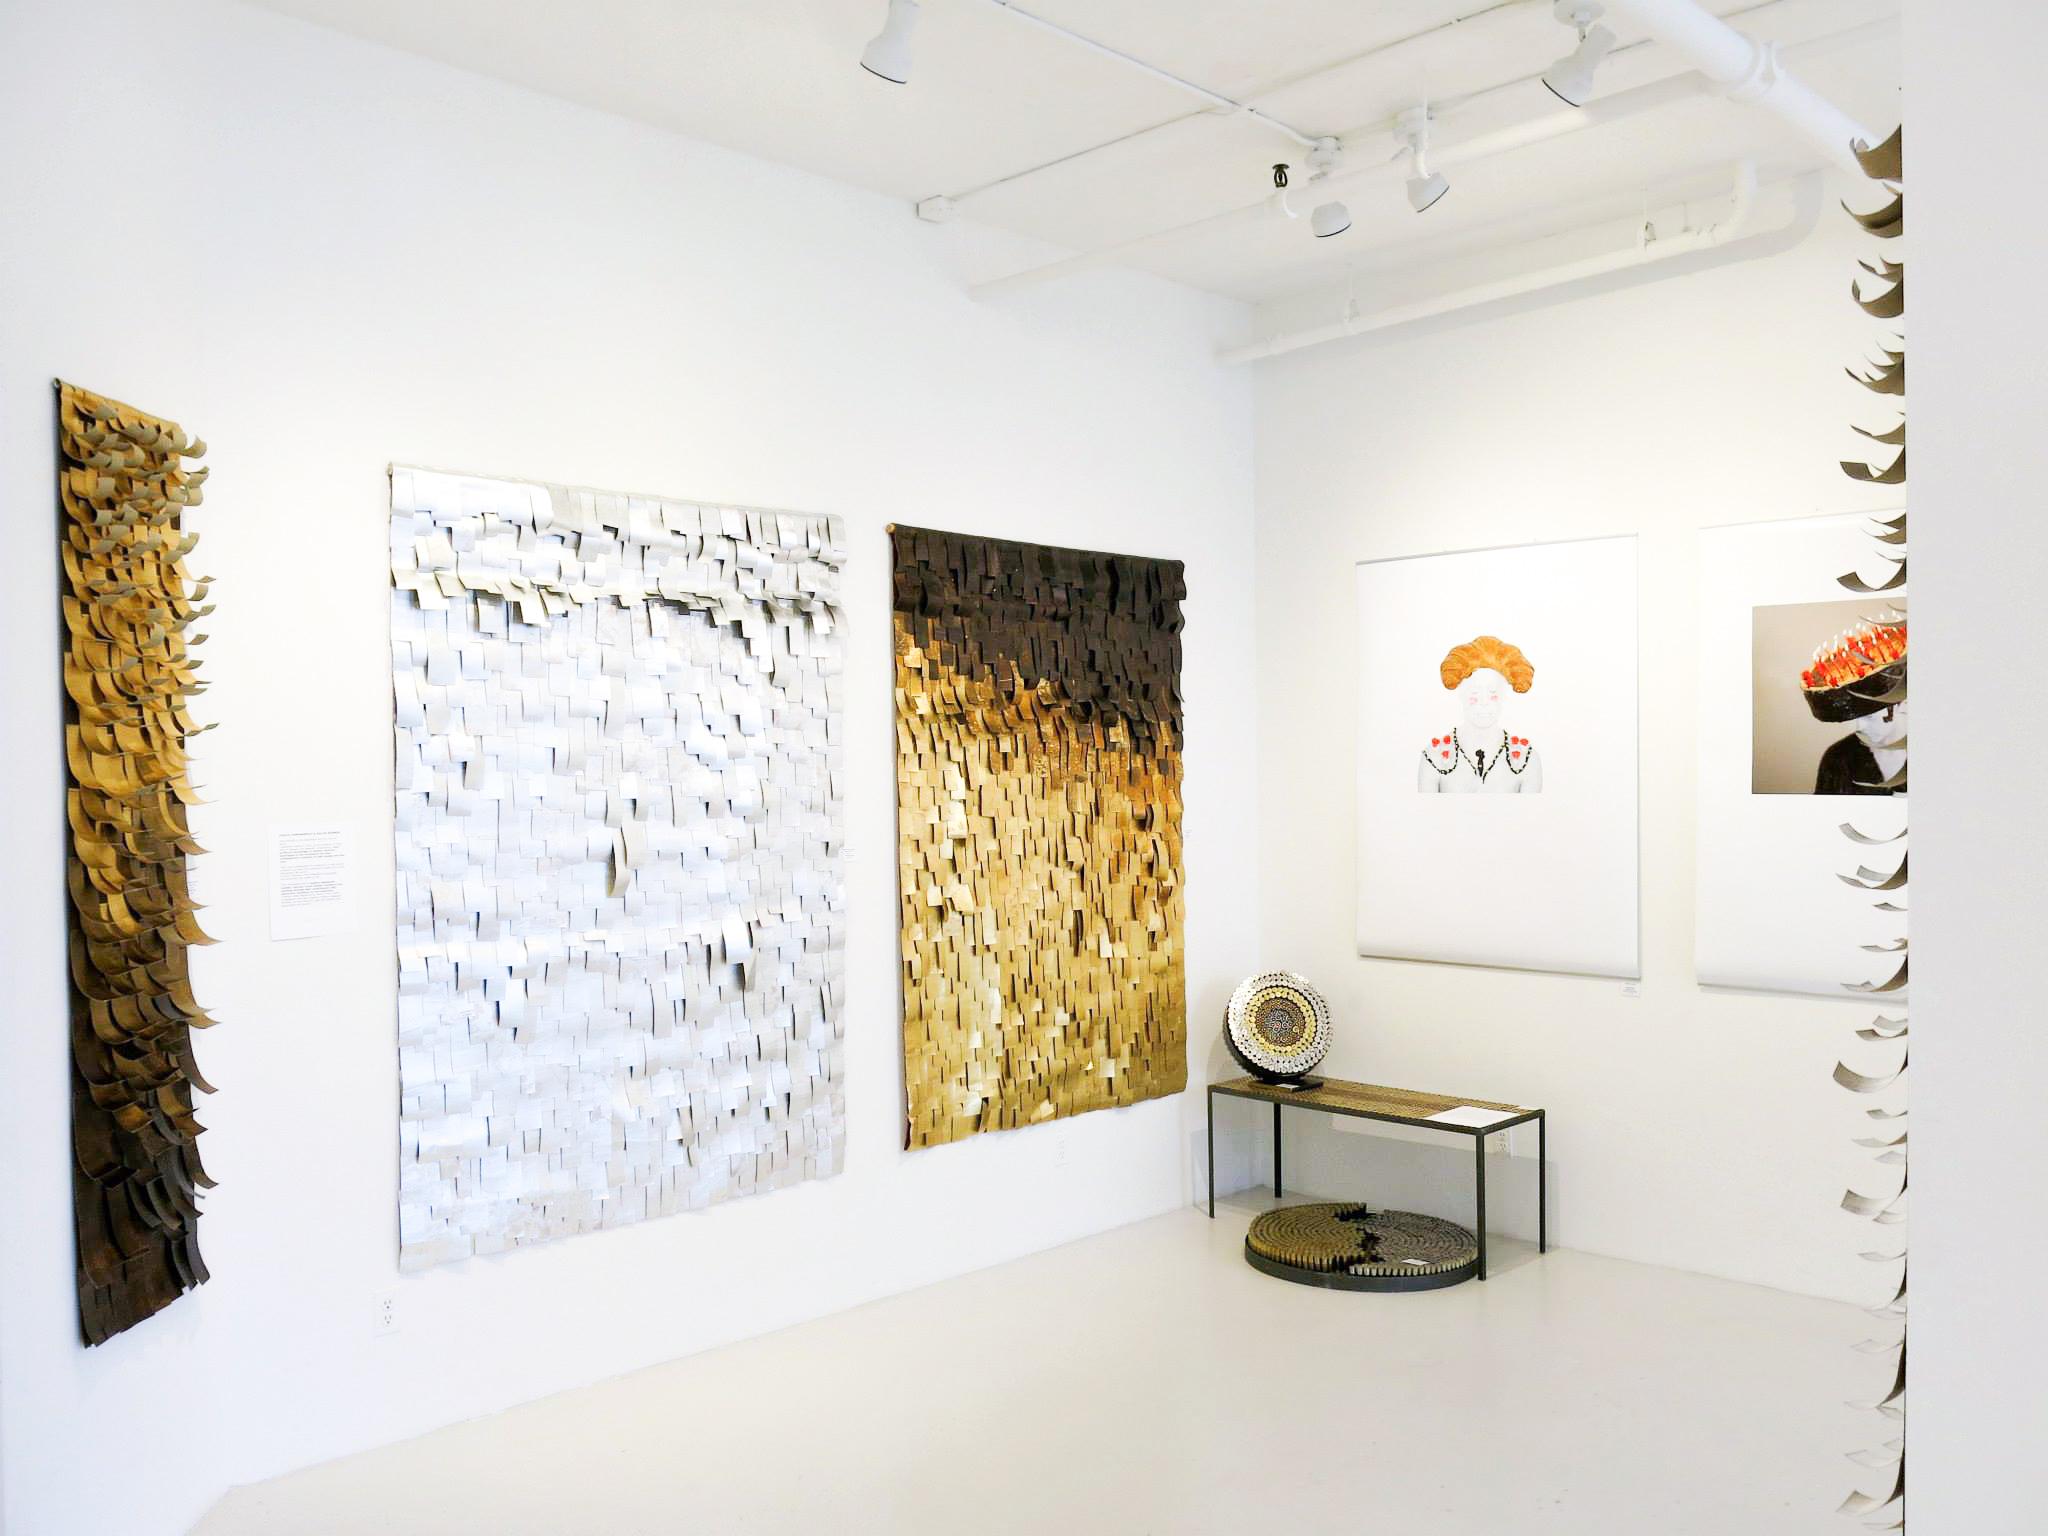 Clen Gallery, una nova pop up gallery italiana a New York - Article by Art Tribune. Francisco Lecci.